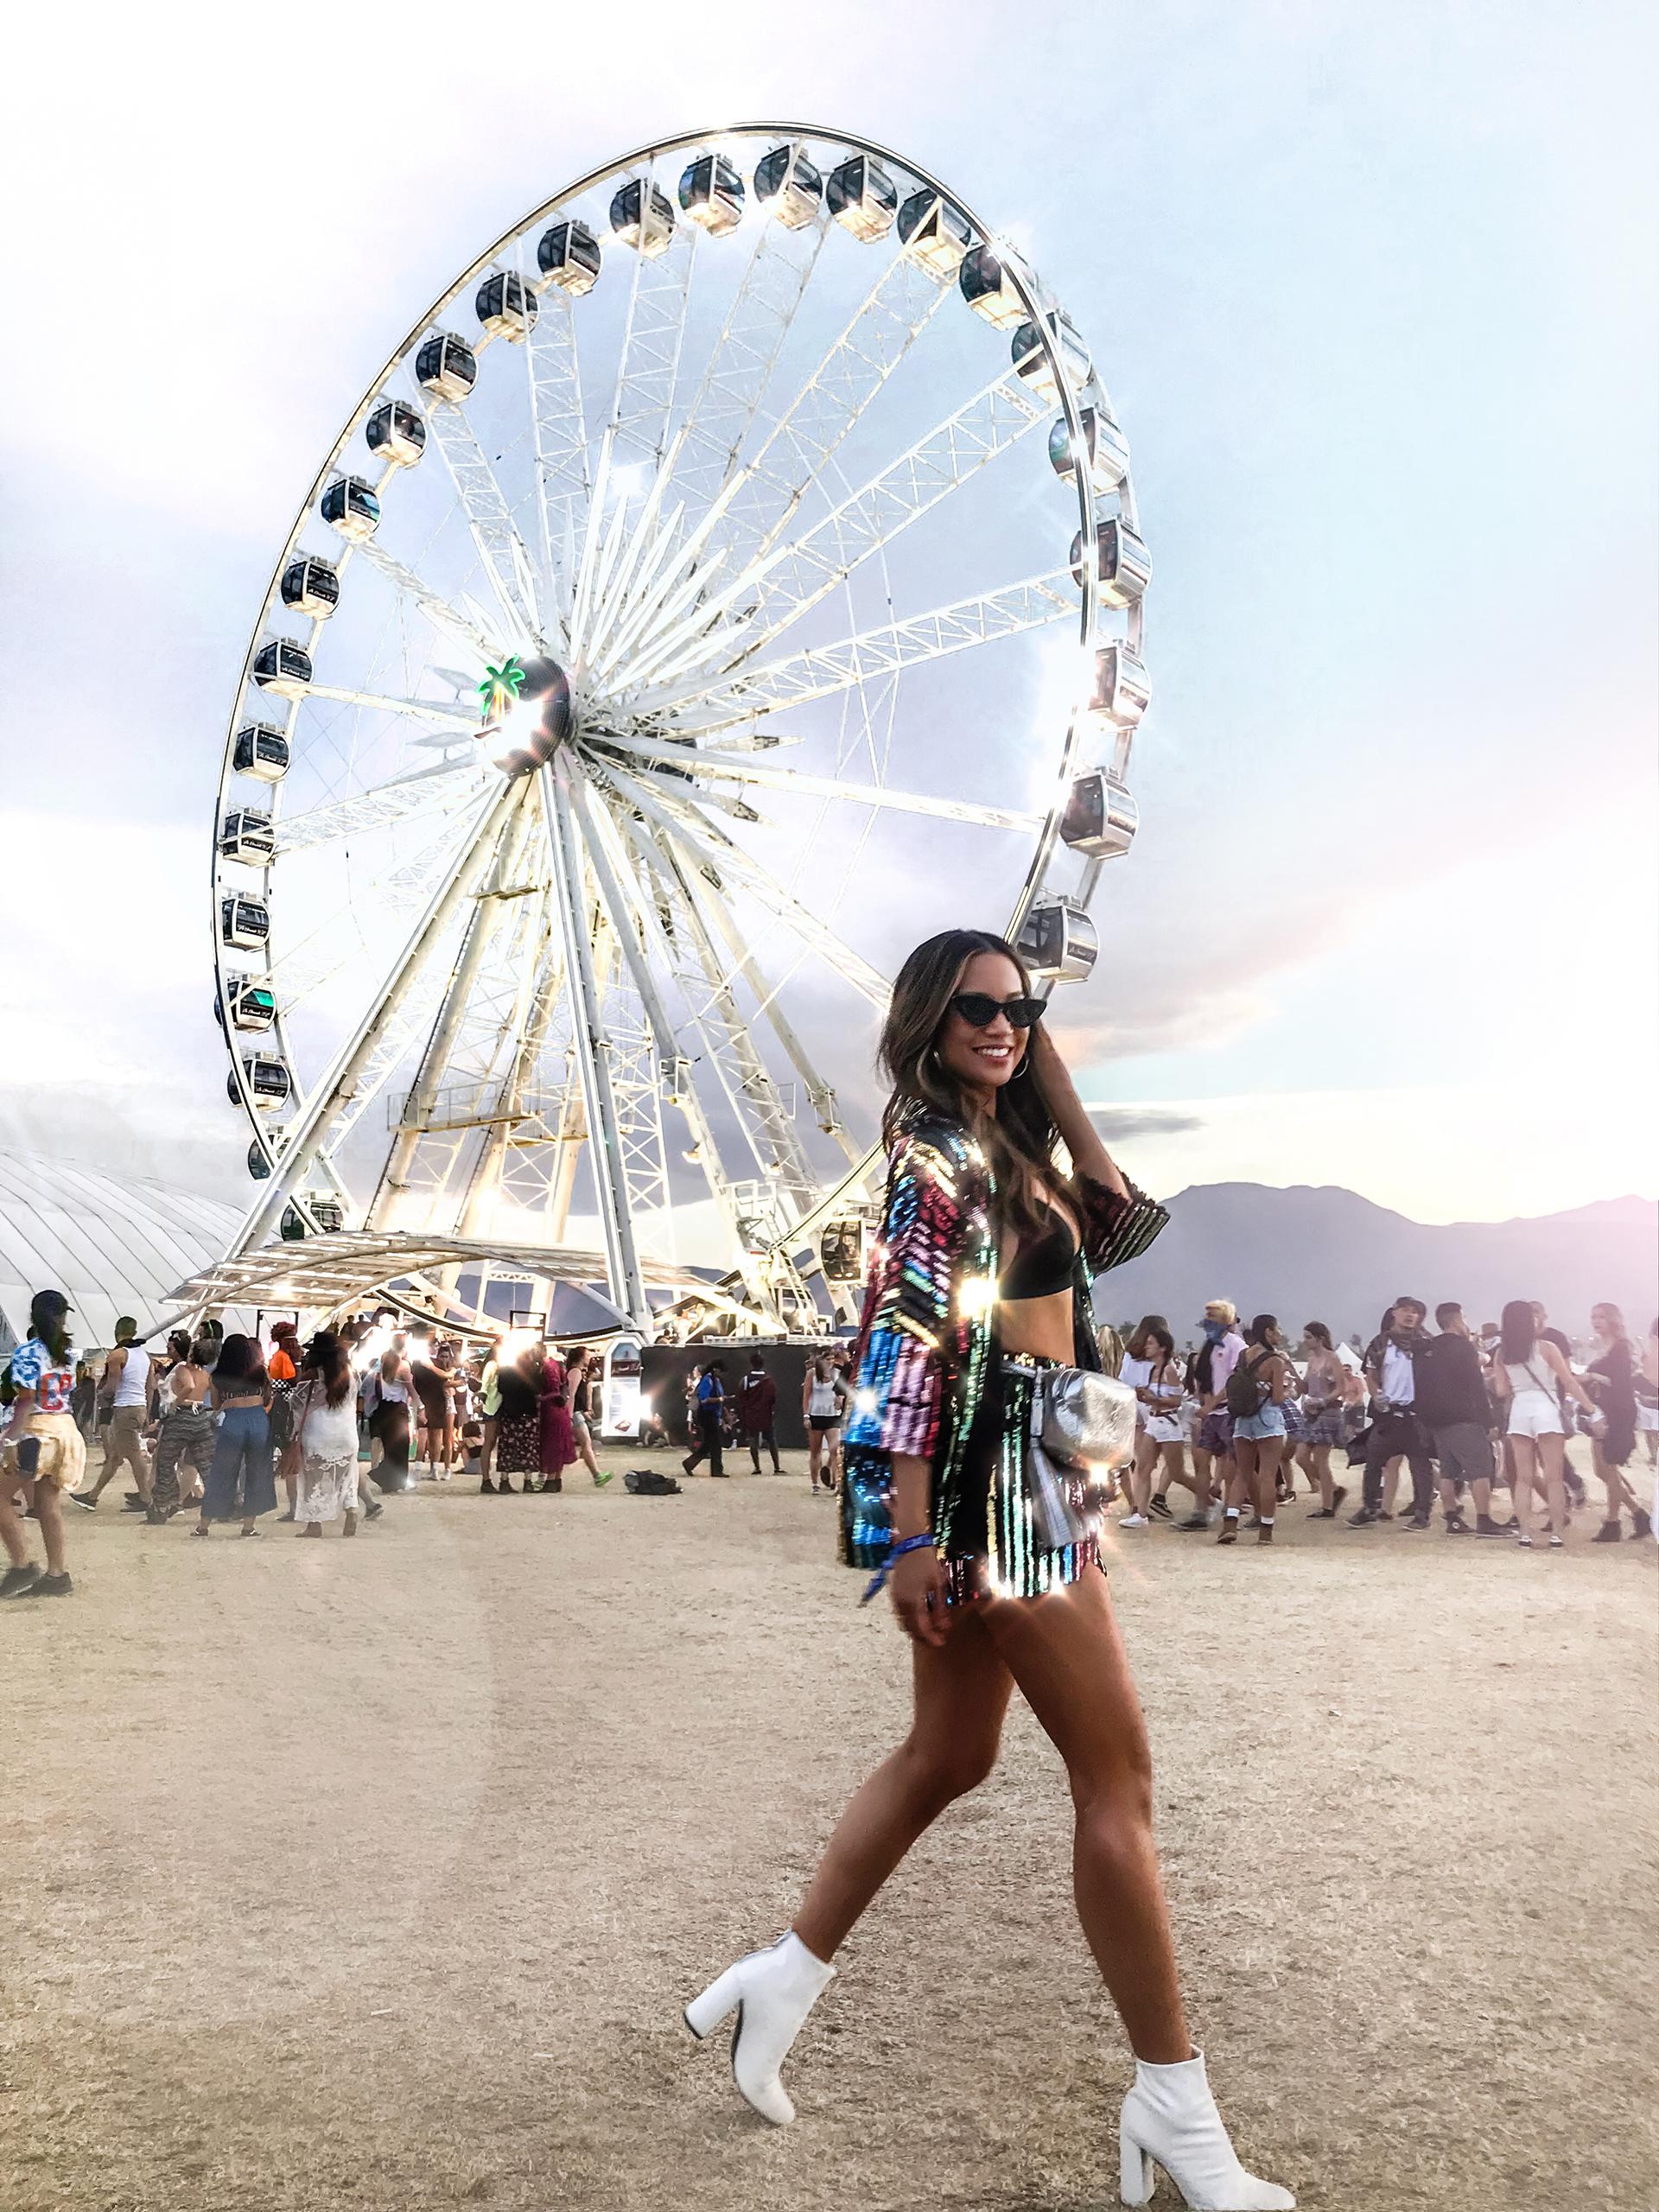 Coachella iconic Ferris wheel best photo opps Coachella guide